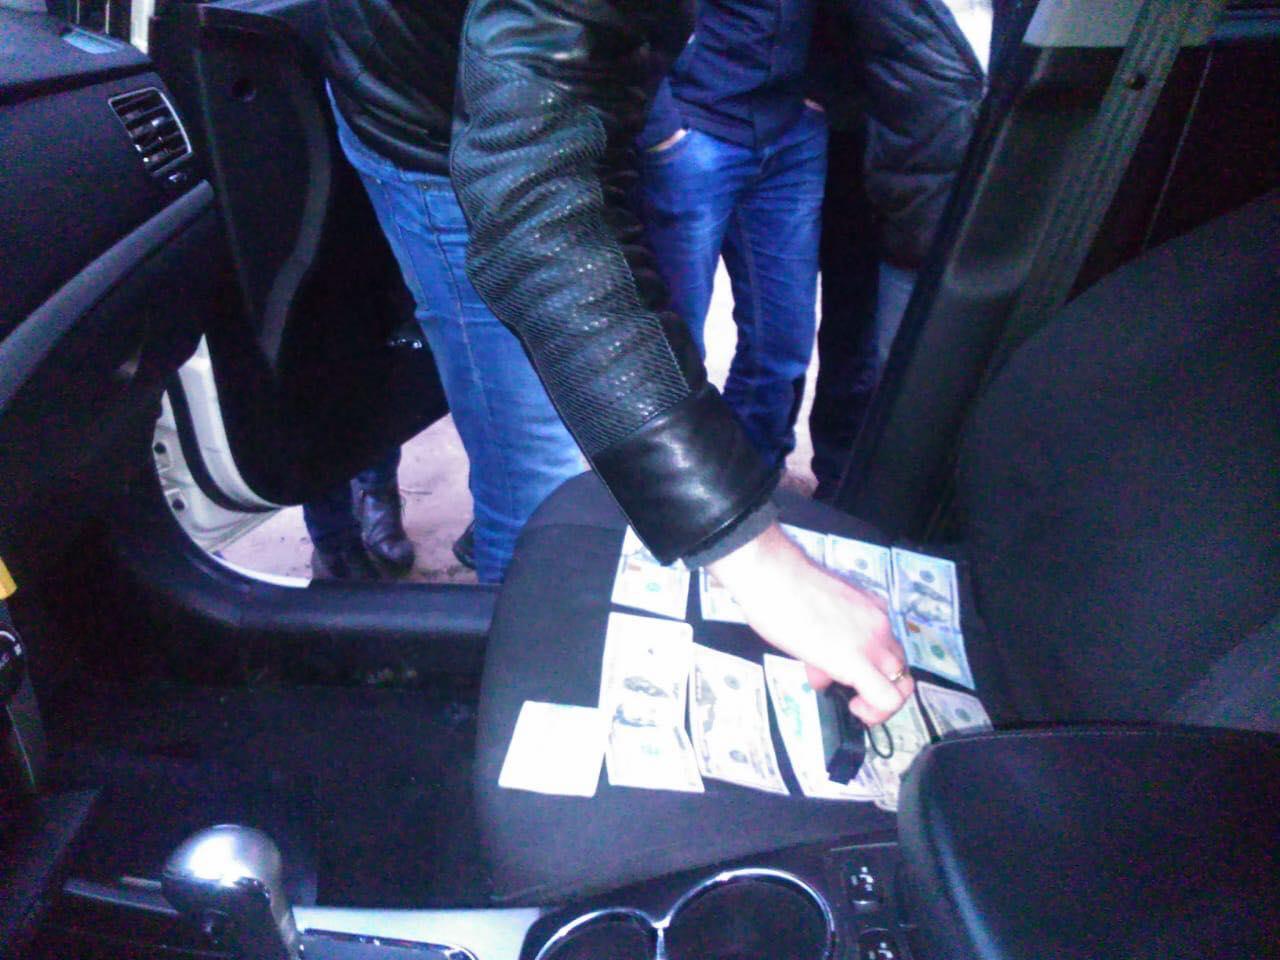 Взяточника арестовали во время передачи денег